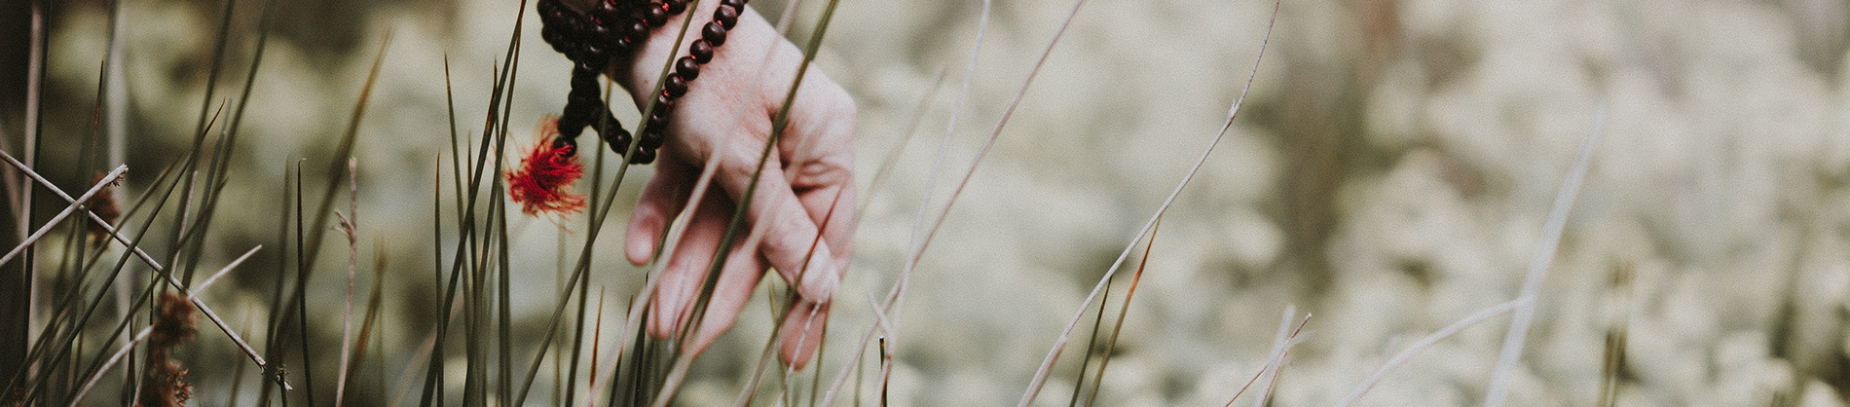 A man brushing his hand across long grass